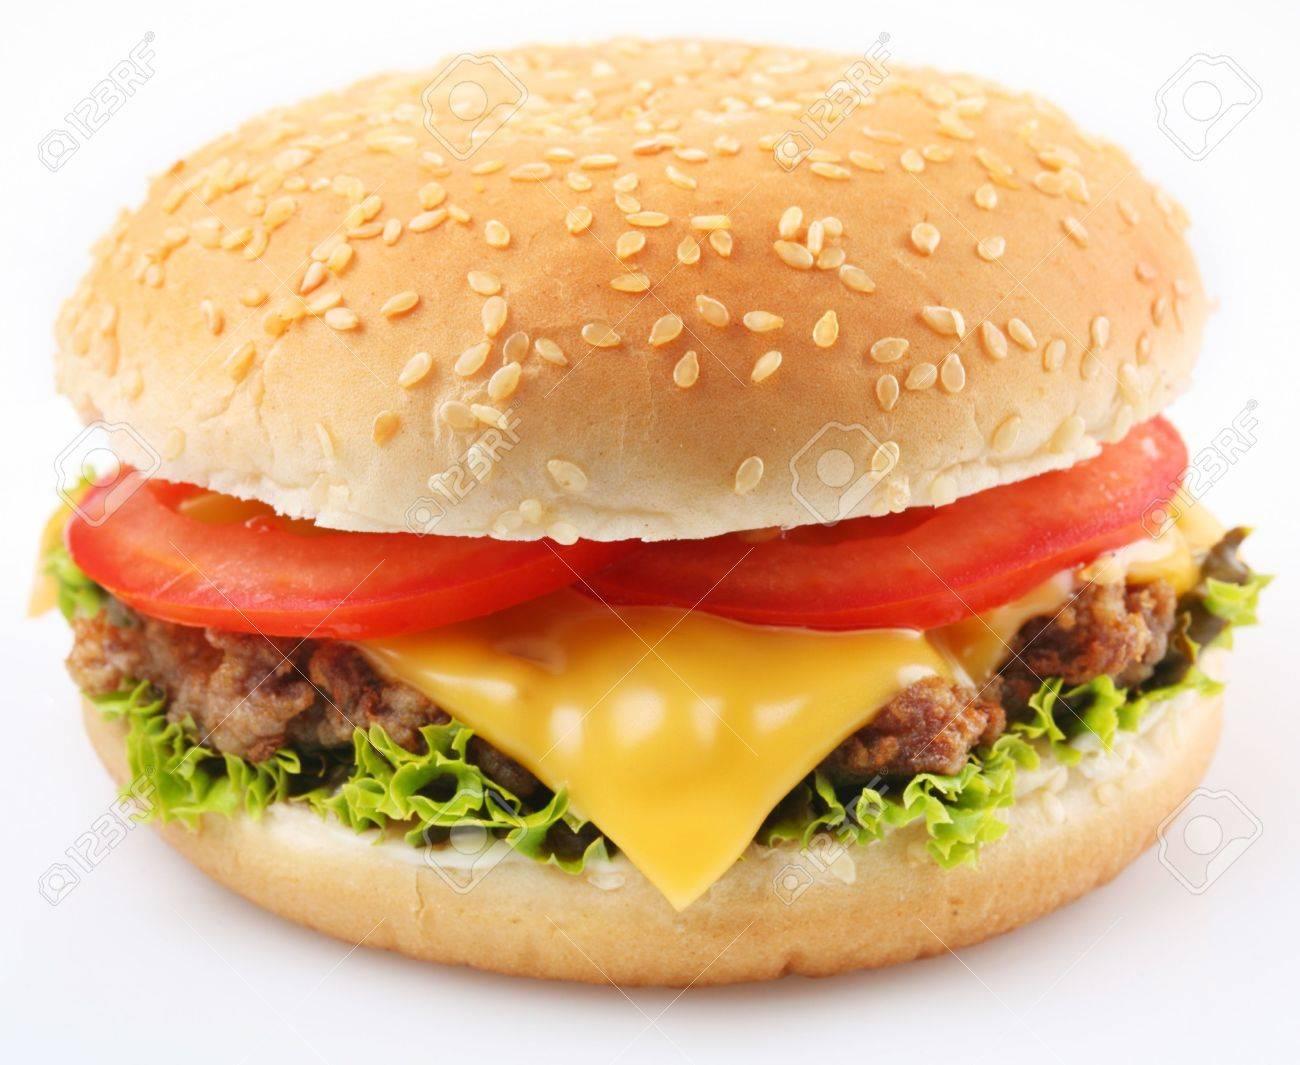 Cheeseburger on a white background Stock Photo - 6305943